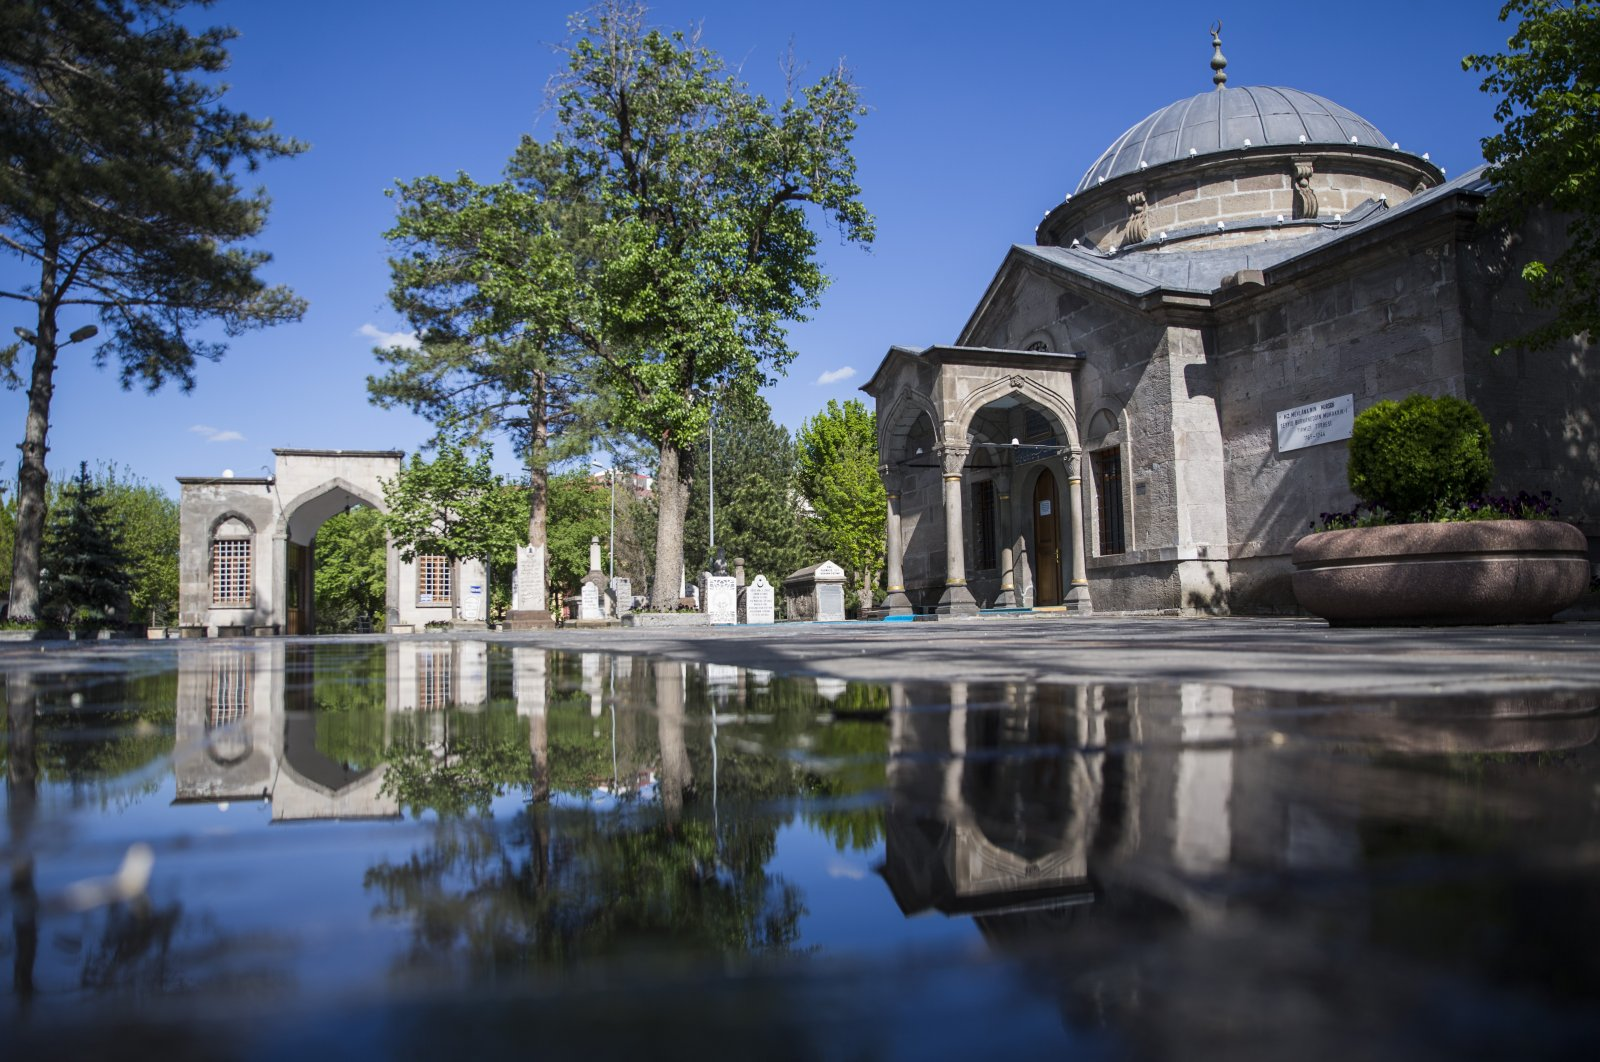 The tomb of Sayyid Burhaneddin was built in 1892 by Kayseri Gov. Mehmet Nazım Pasha, Kayseri, Turkey. (AA Photo)